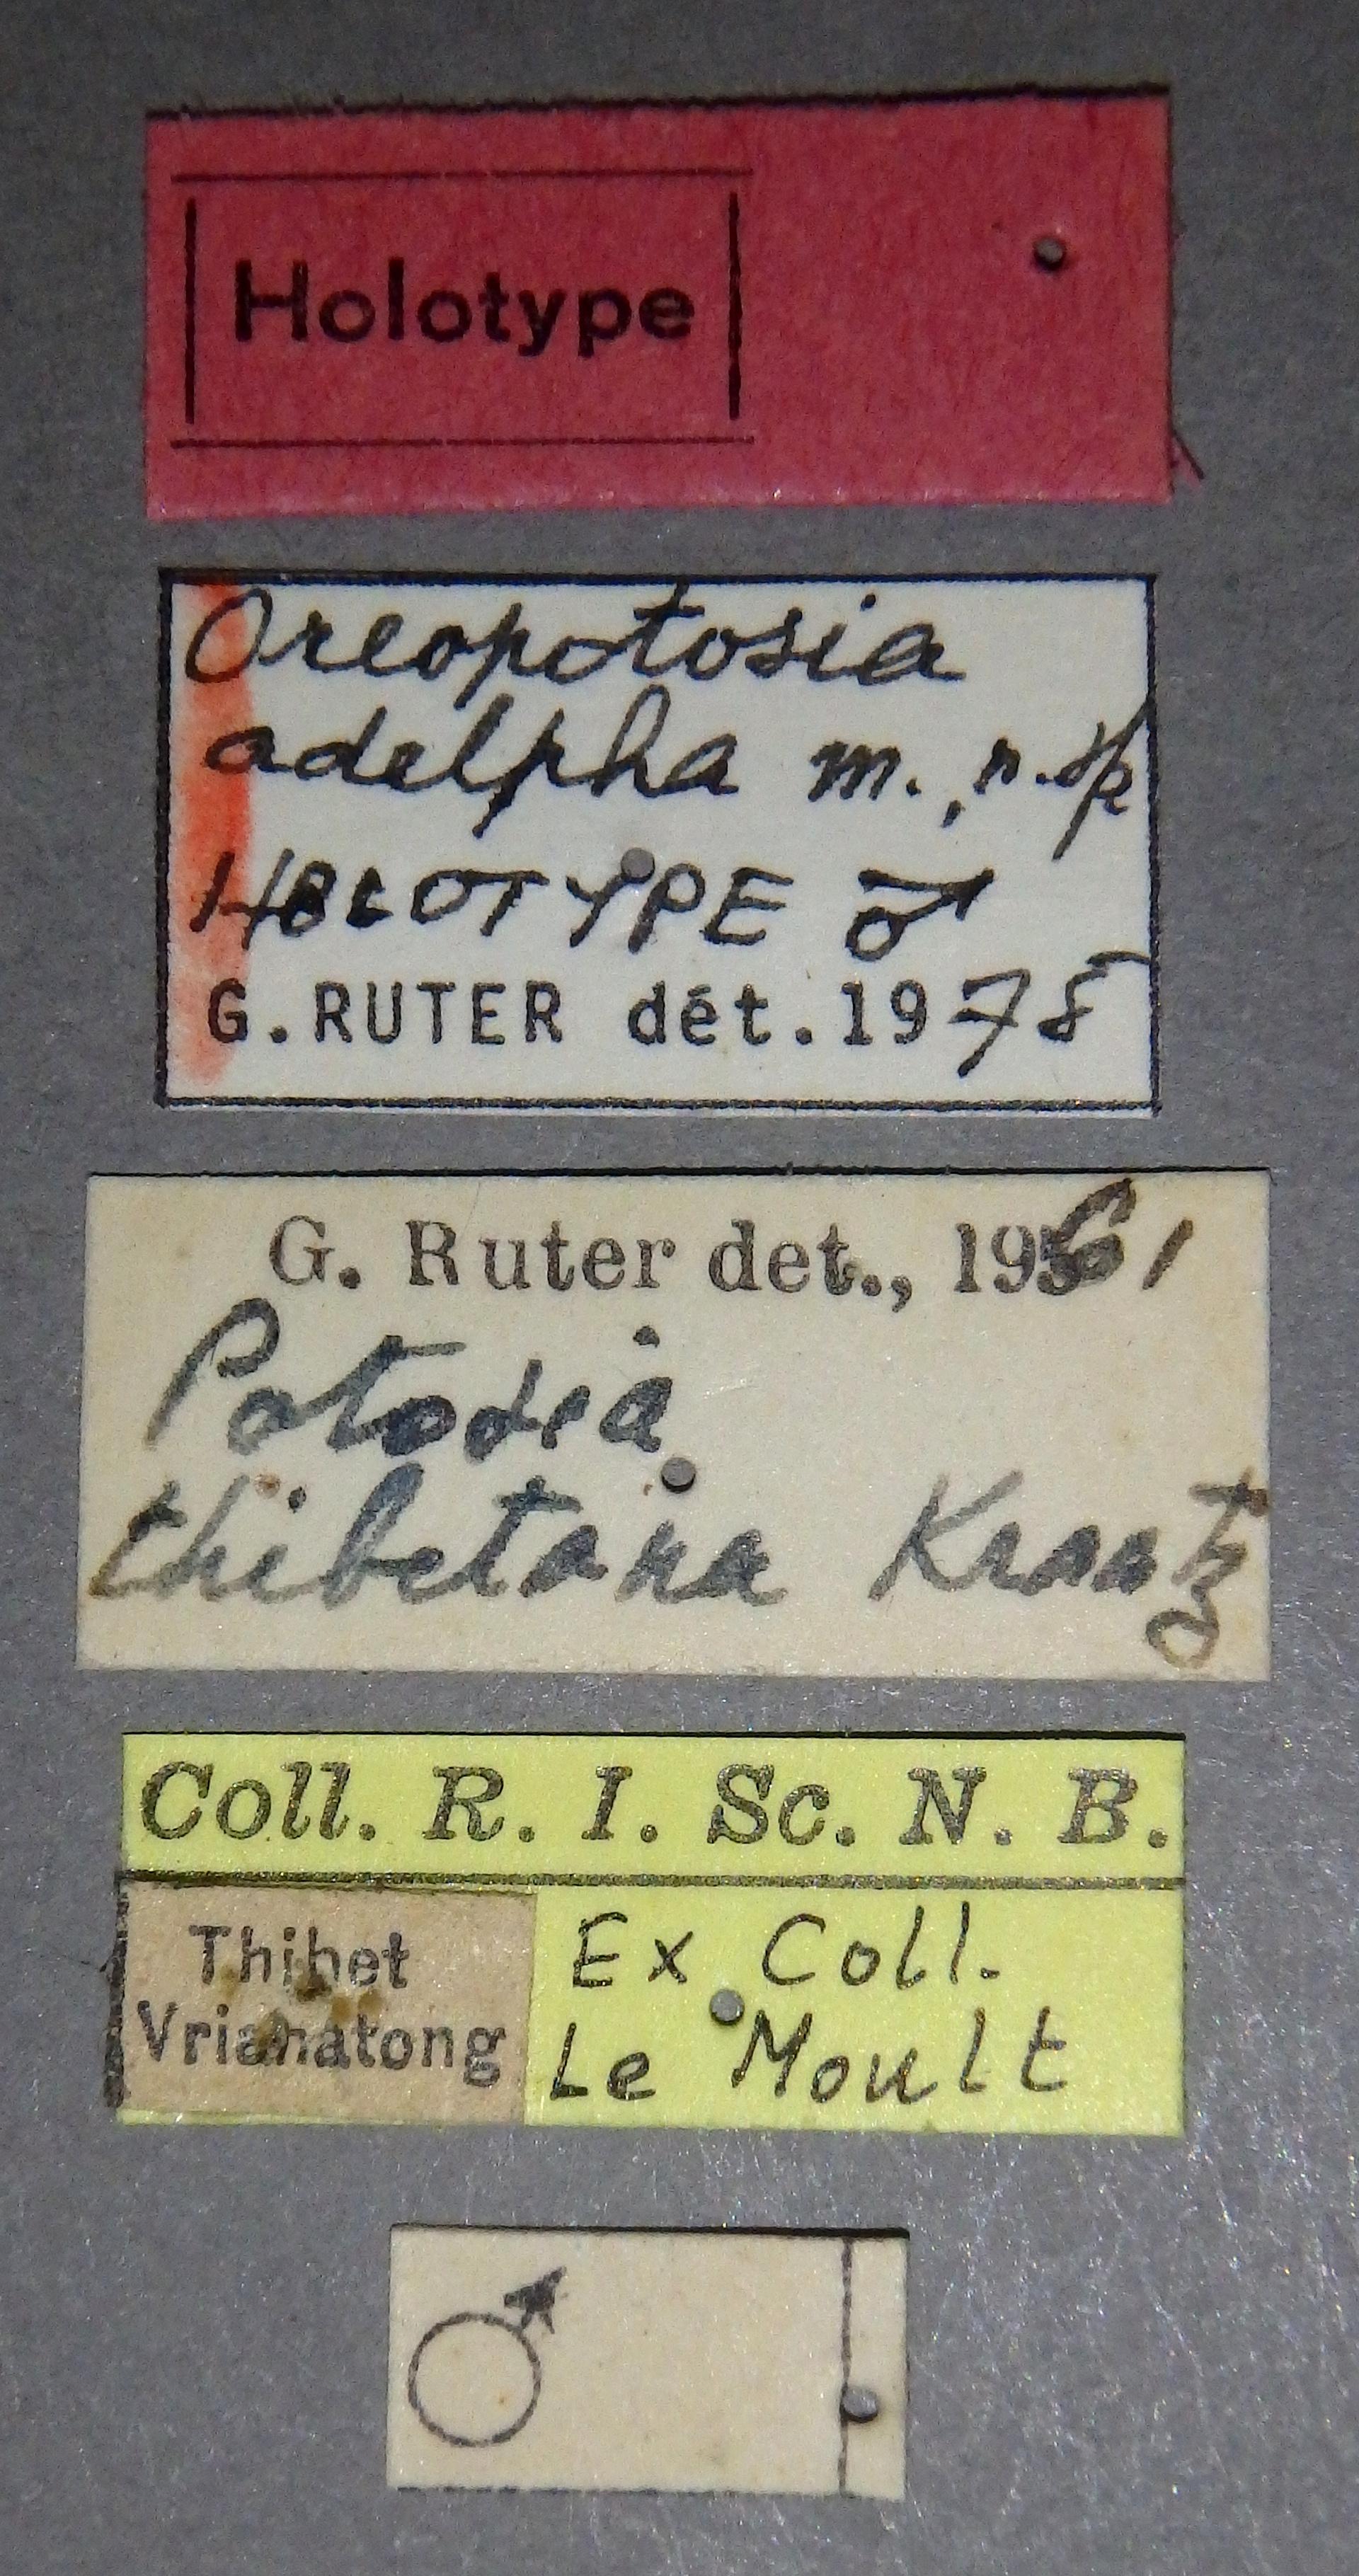 Oreopotosia adelpha ht Lb.JPG